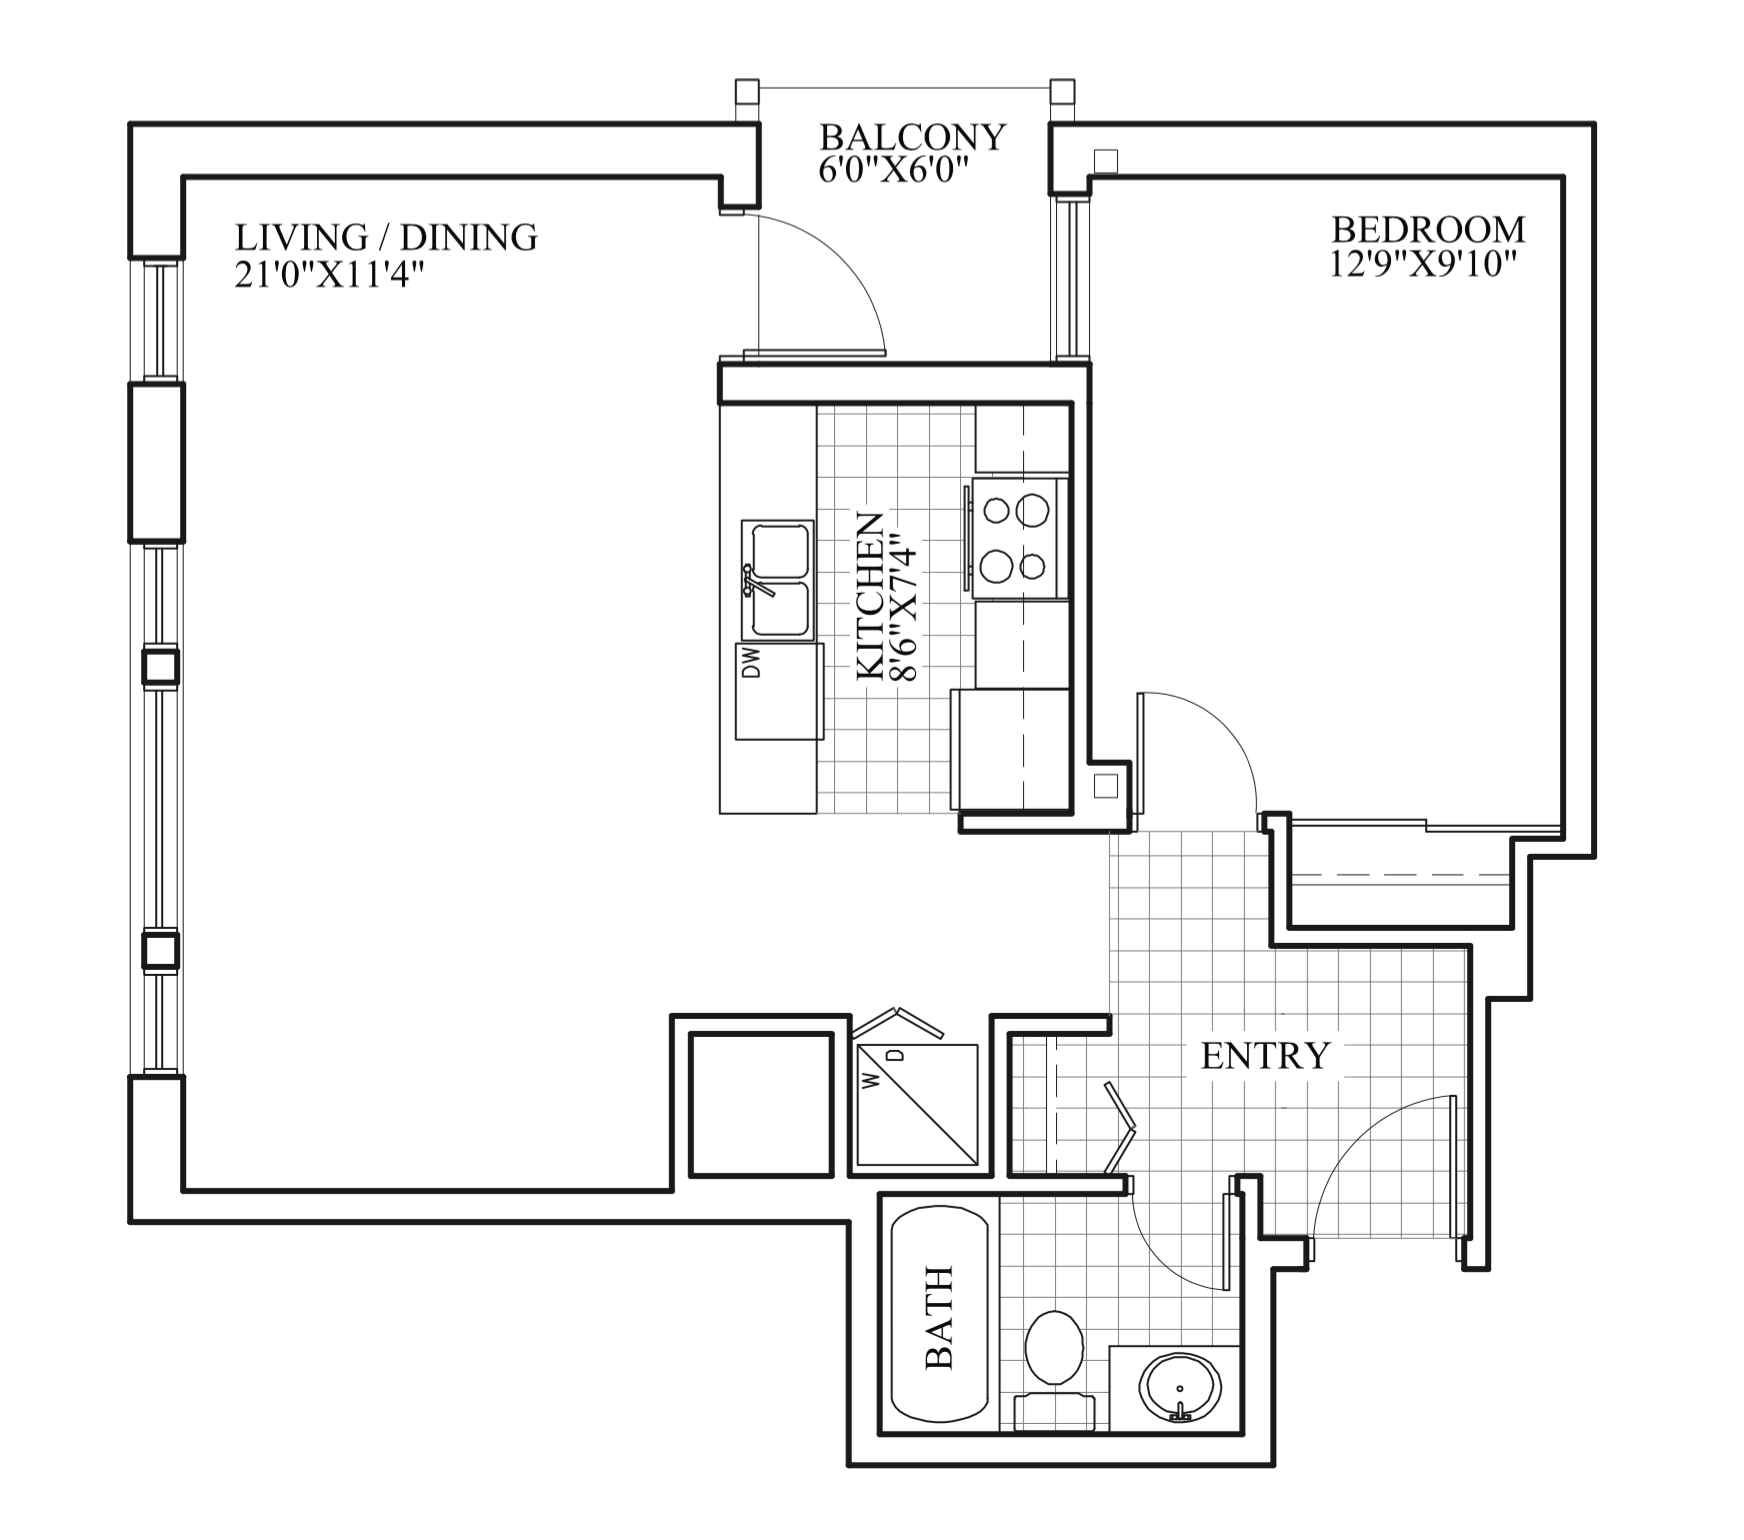 SOLD | Suite 202 | 685 sq ft